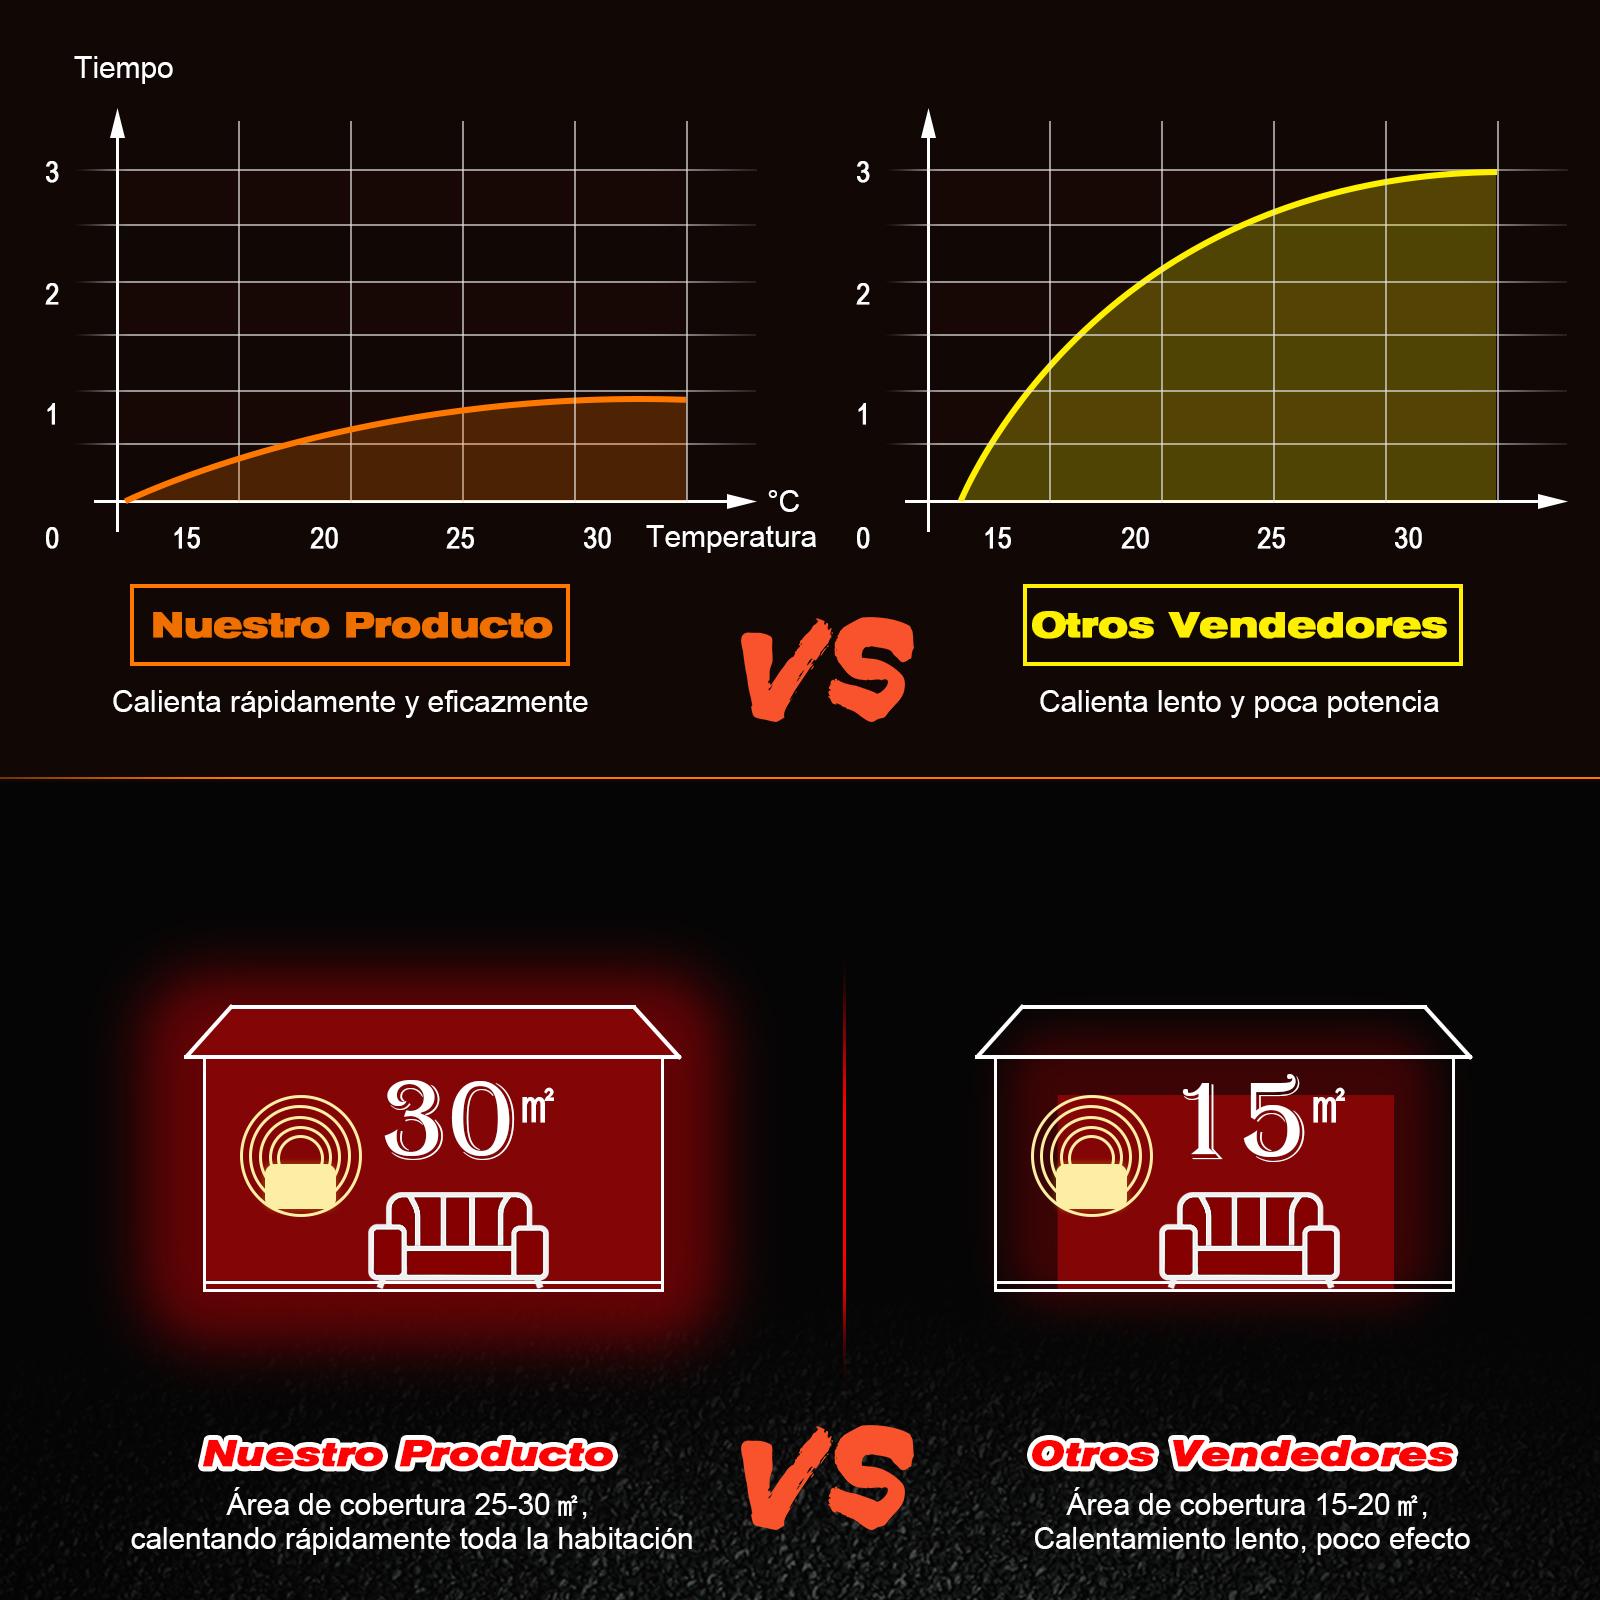 Chimenea-Electrica-de-Pared-Vertical-Estufas-Electricas-Llama-LED-6-Tipos-Nuevo miniatura 43